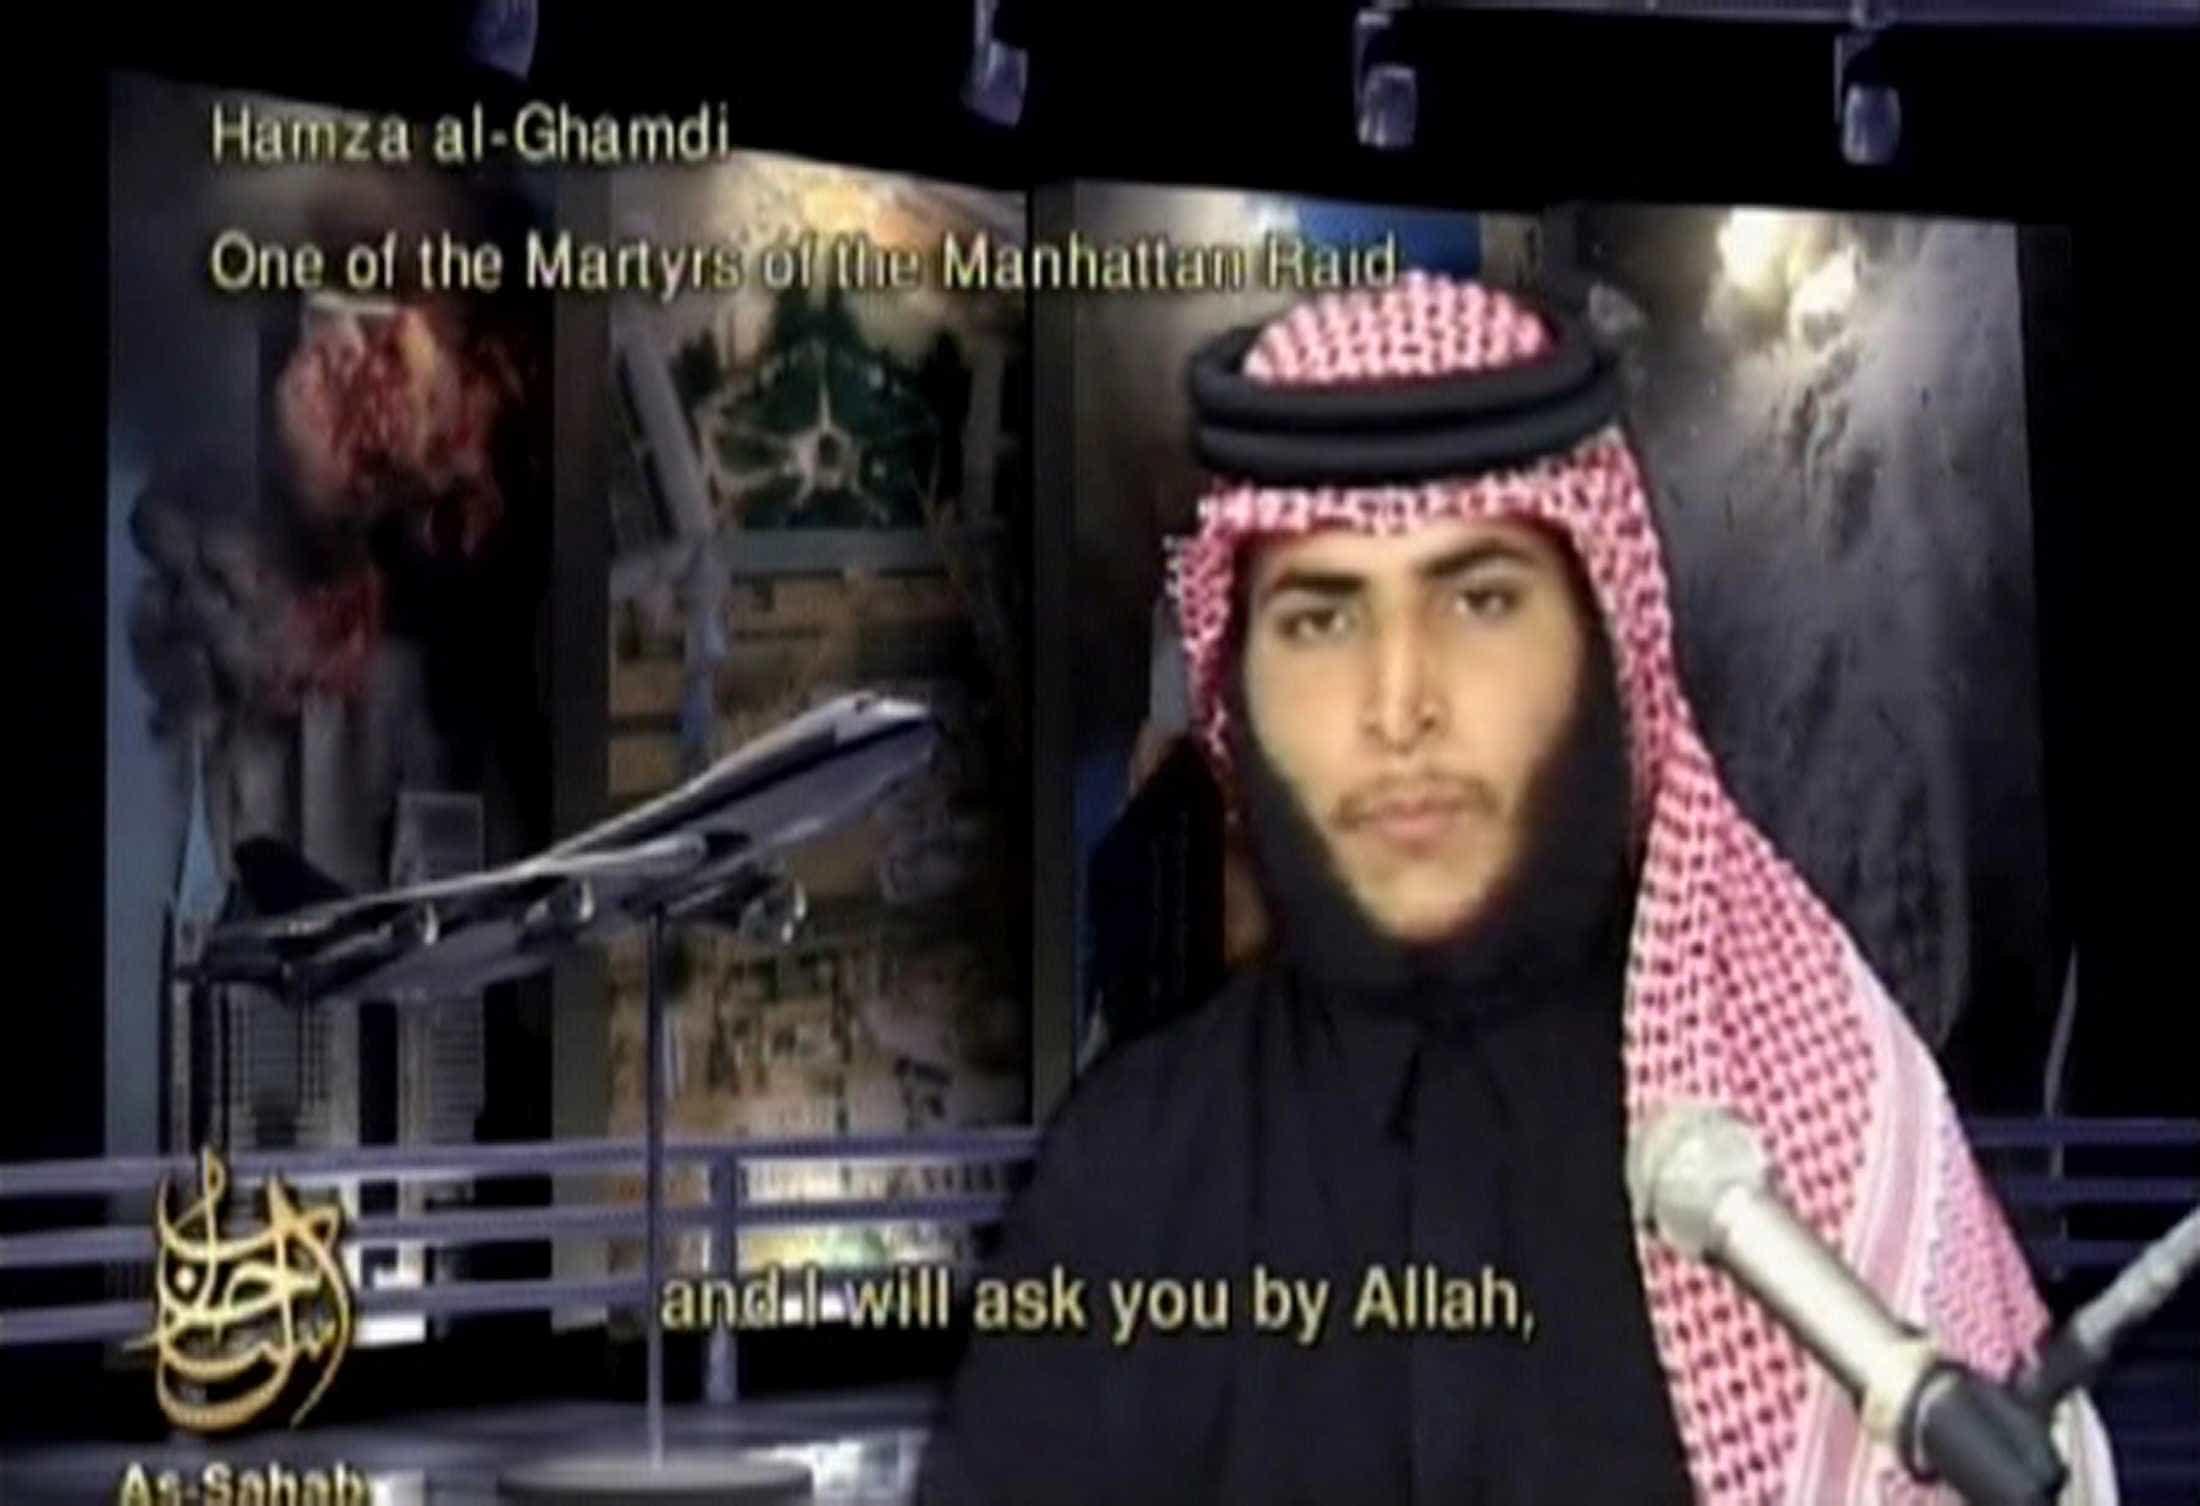 Arábia Saudita anula cidadania do filho de Osama bin Laden